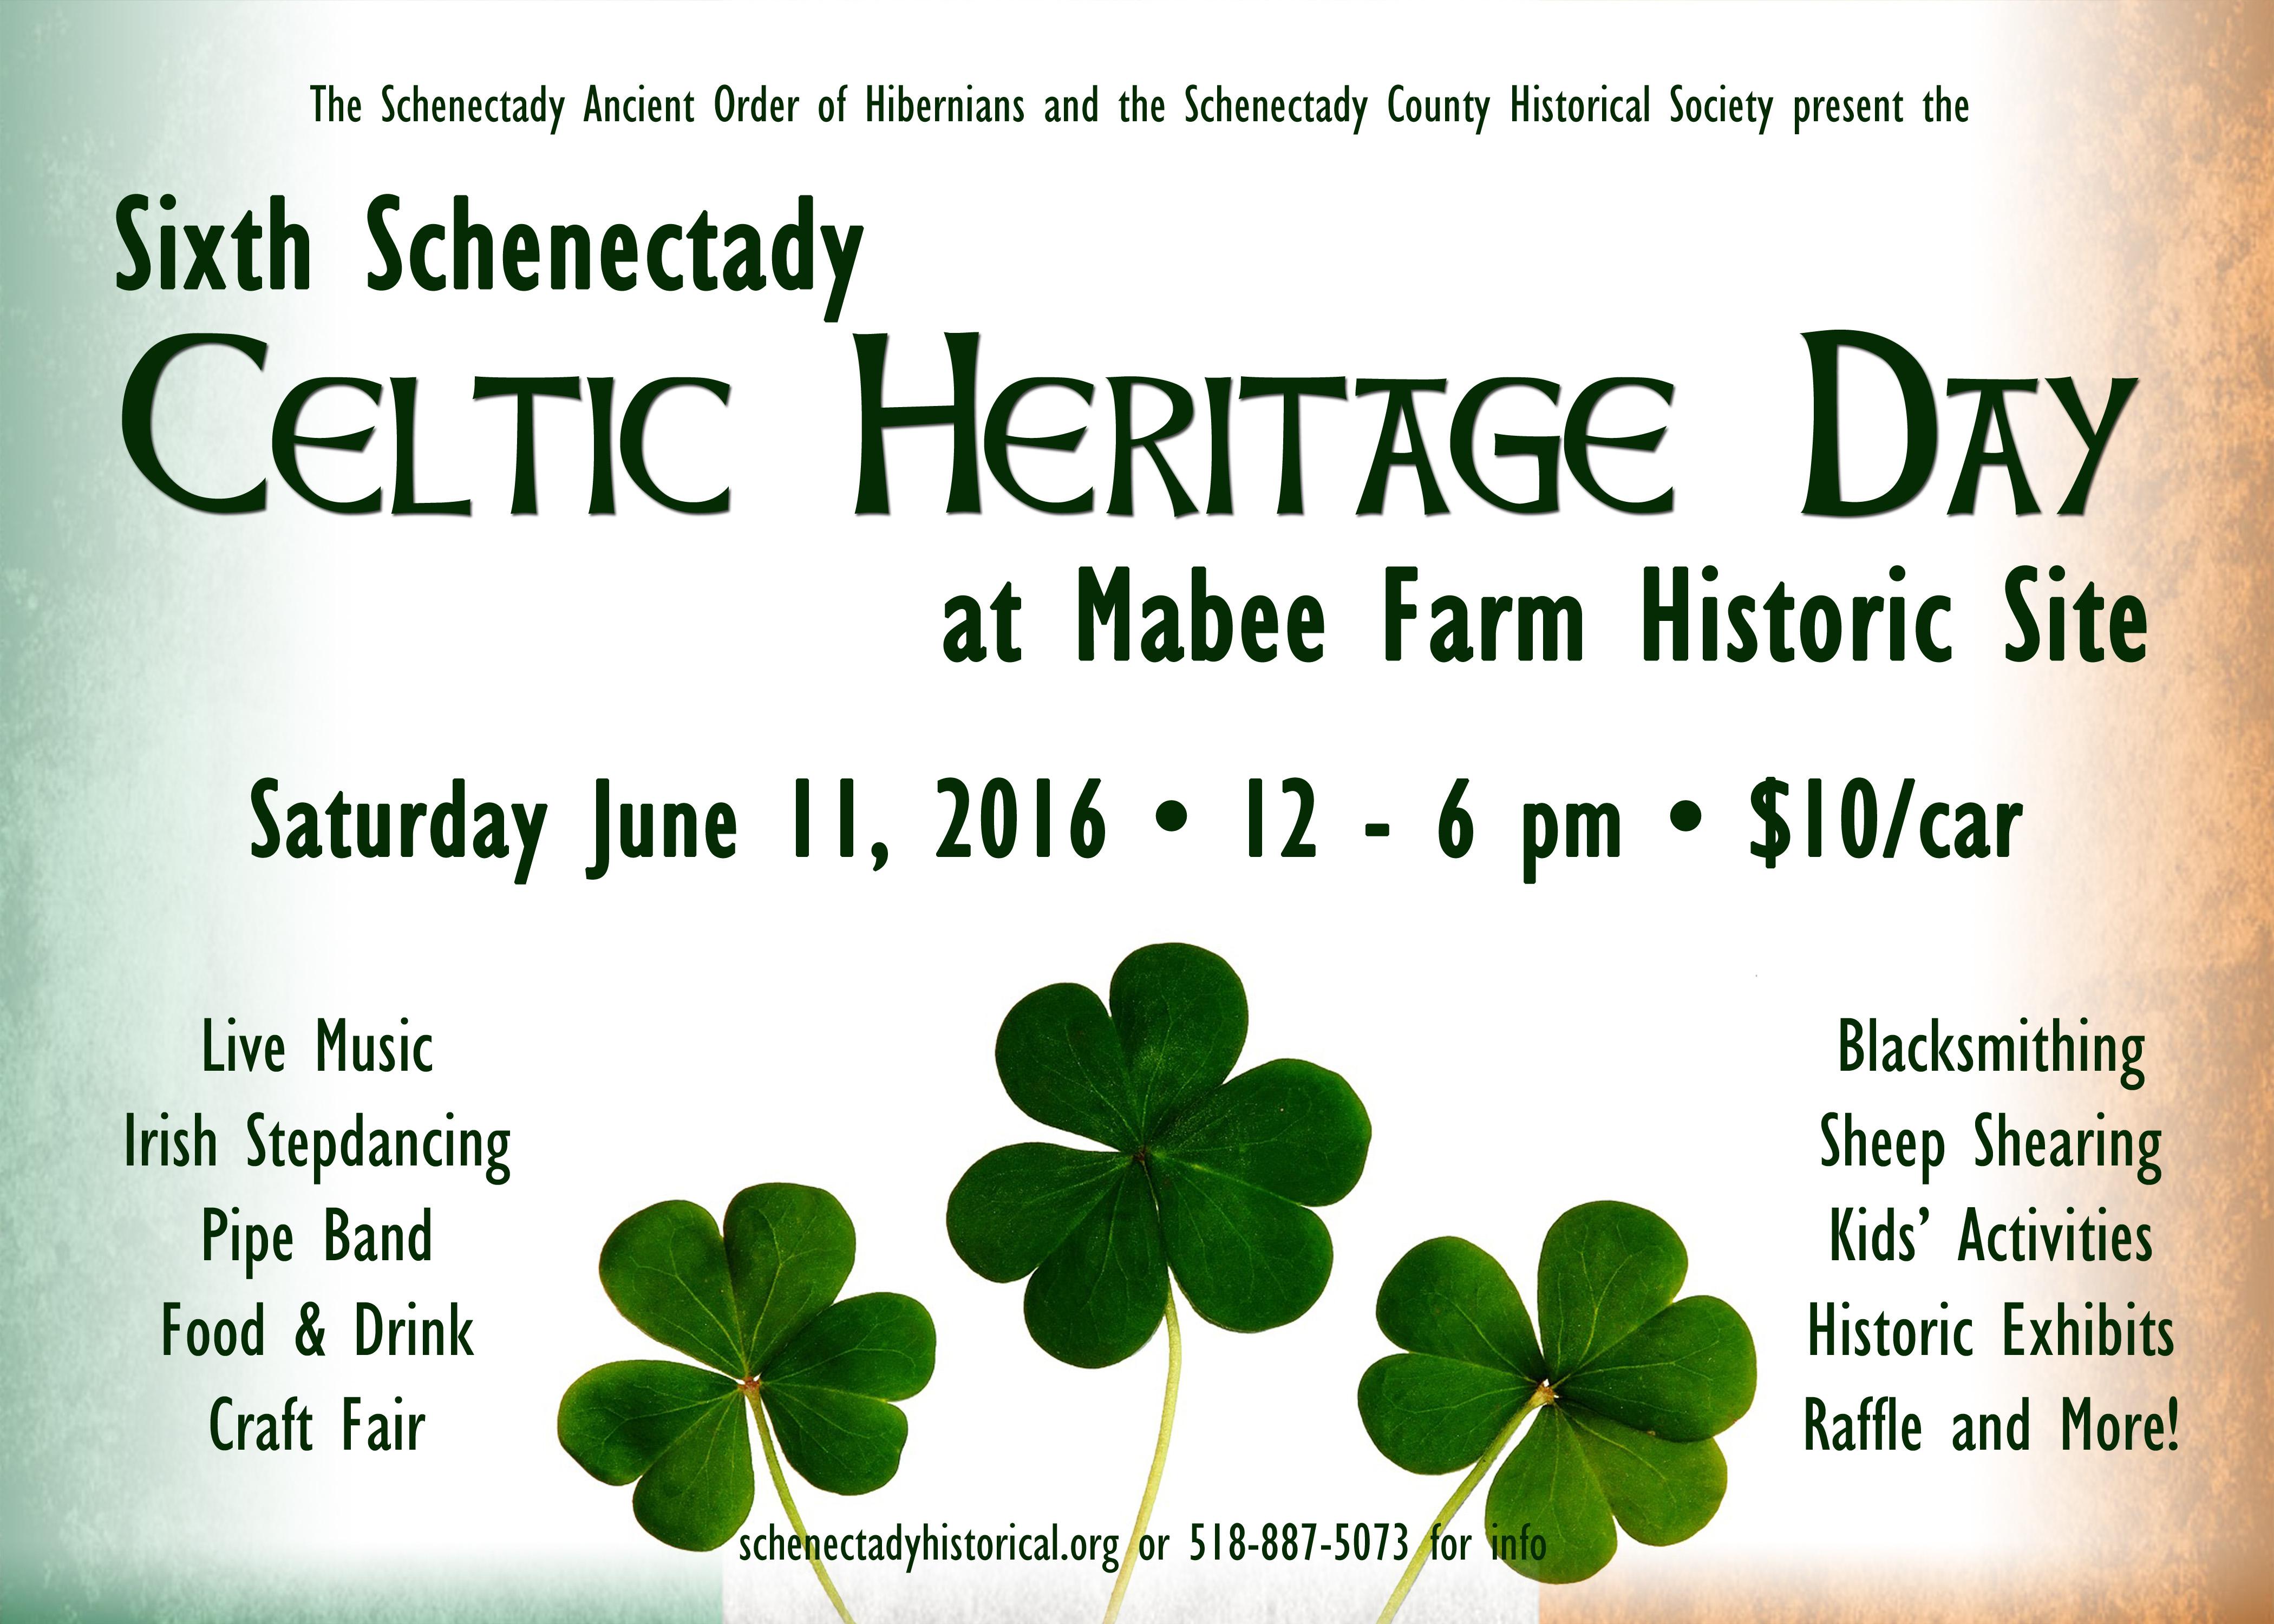 Celtic Heritage Day